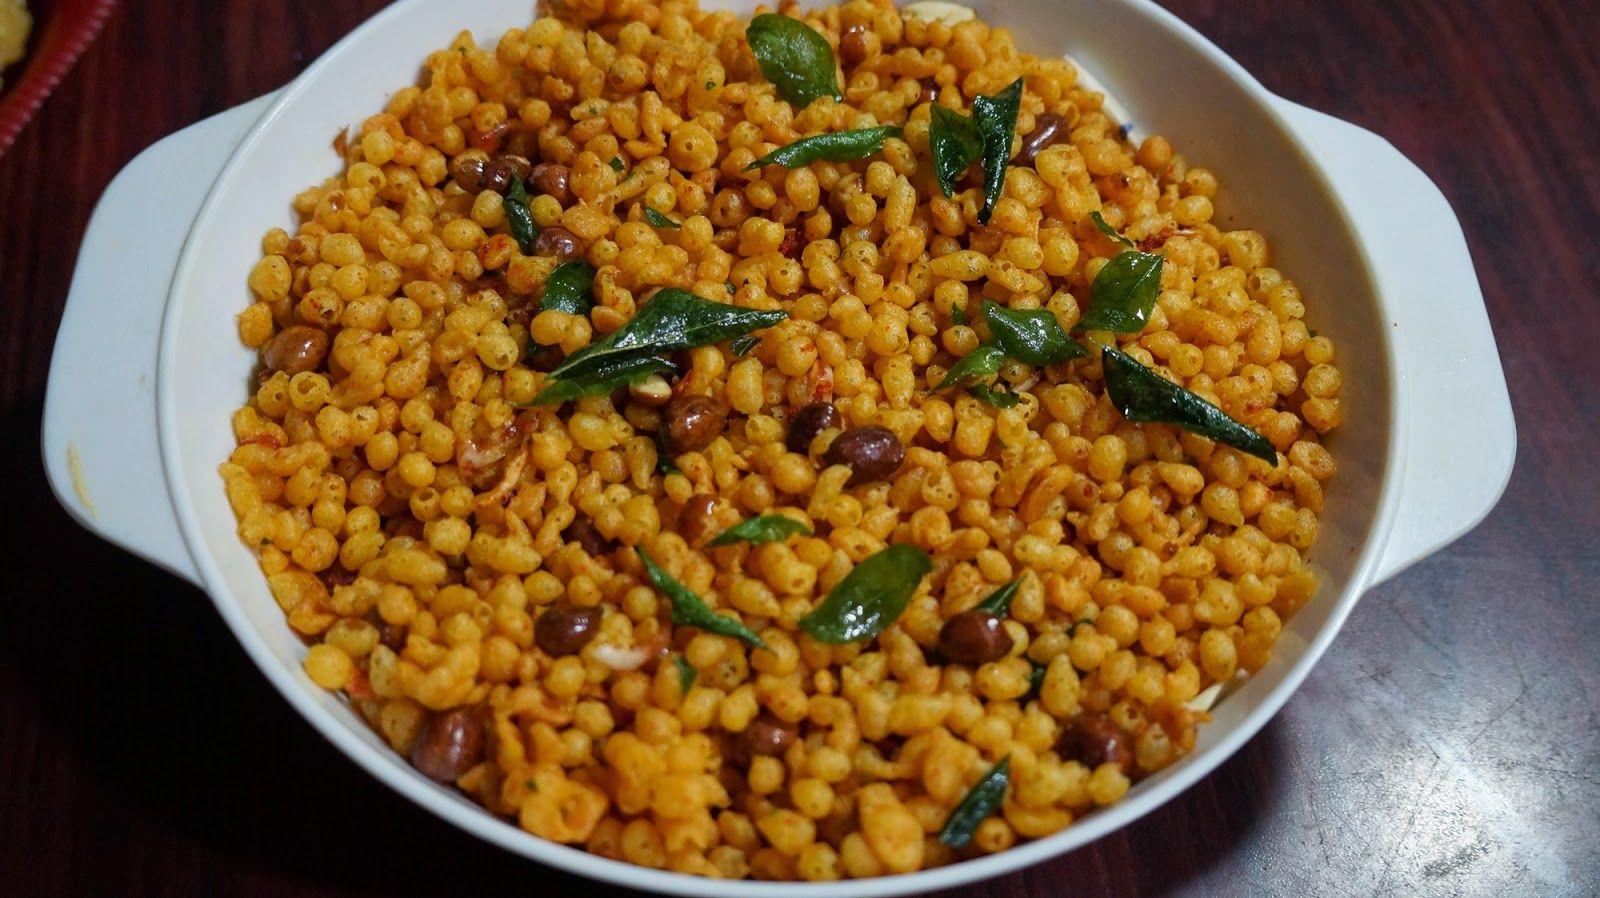 Karam boondi siriplaza andhra recipes telugu vantalu indian food karam boondi siriplaza andhra recipes telugu forumfinder Image collections